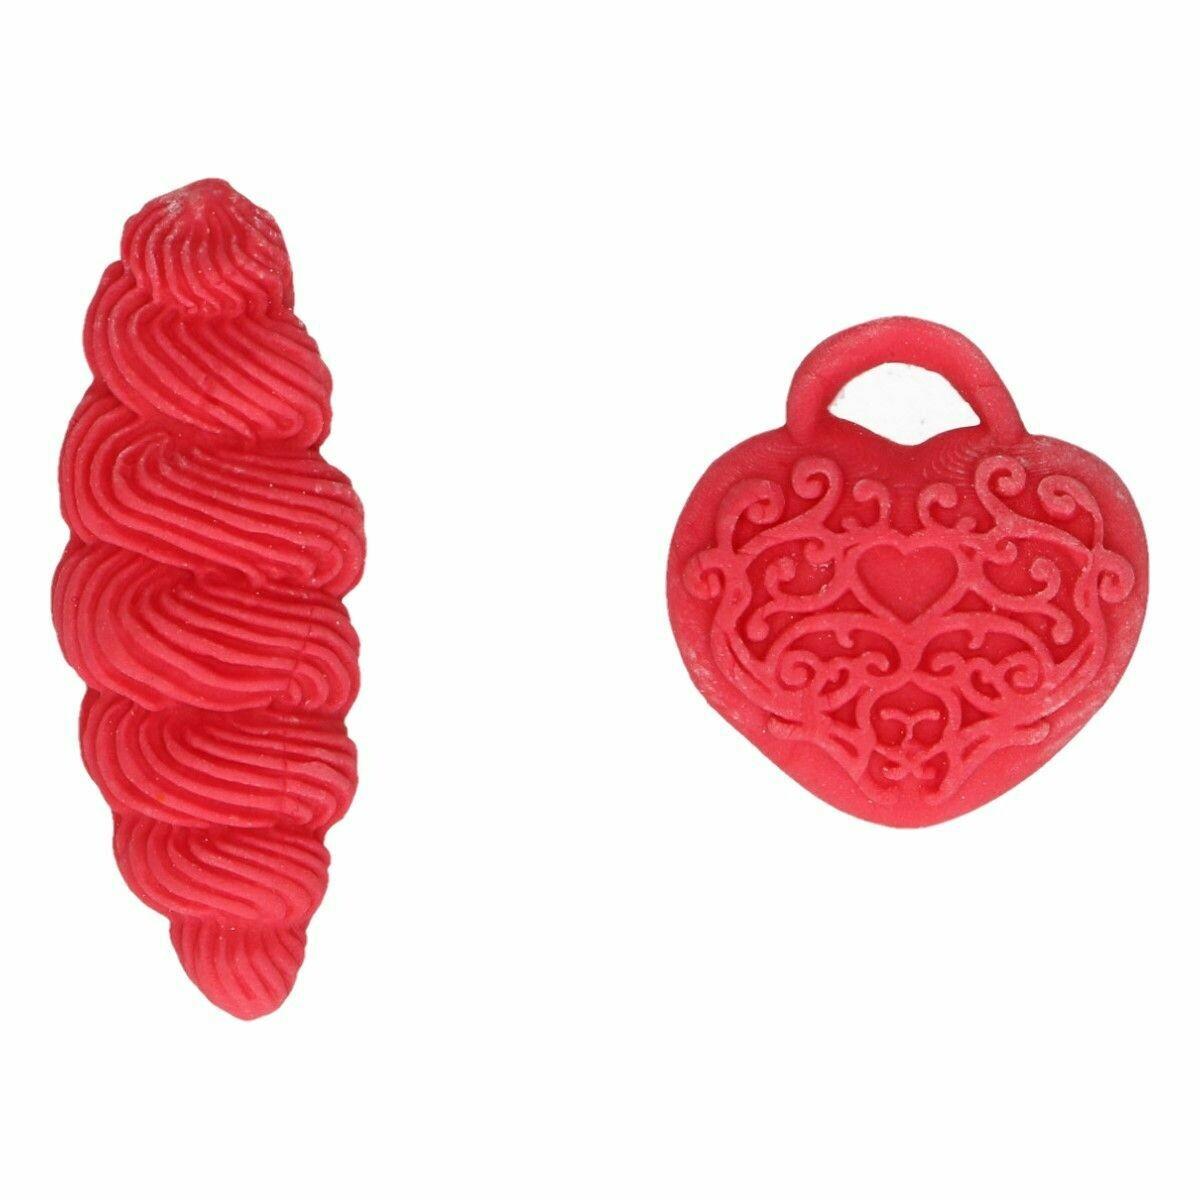 FunCakes FunColours GEL -POPPY RED - Χρώμα Πάστας Τζελ - Κόκκινο παπαρούνας 30γρ